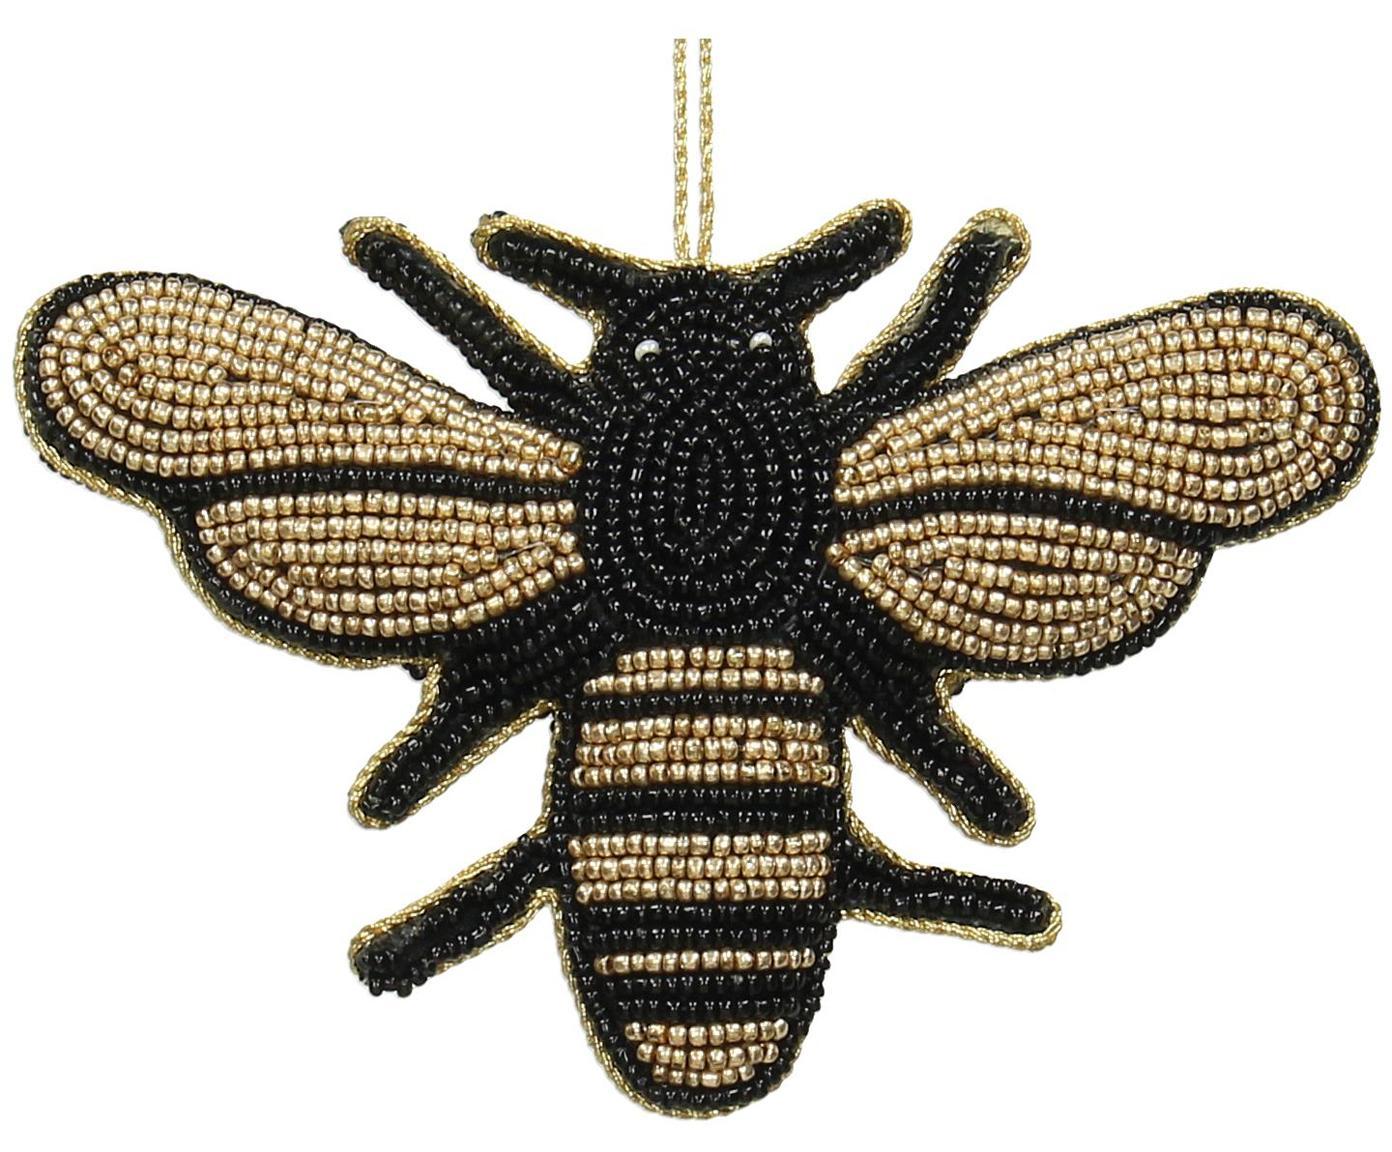 Baumanhänger Bee, 2 Stück, Goldfarben, Schwarz, 14 x 10 cm